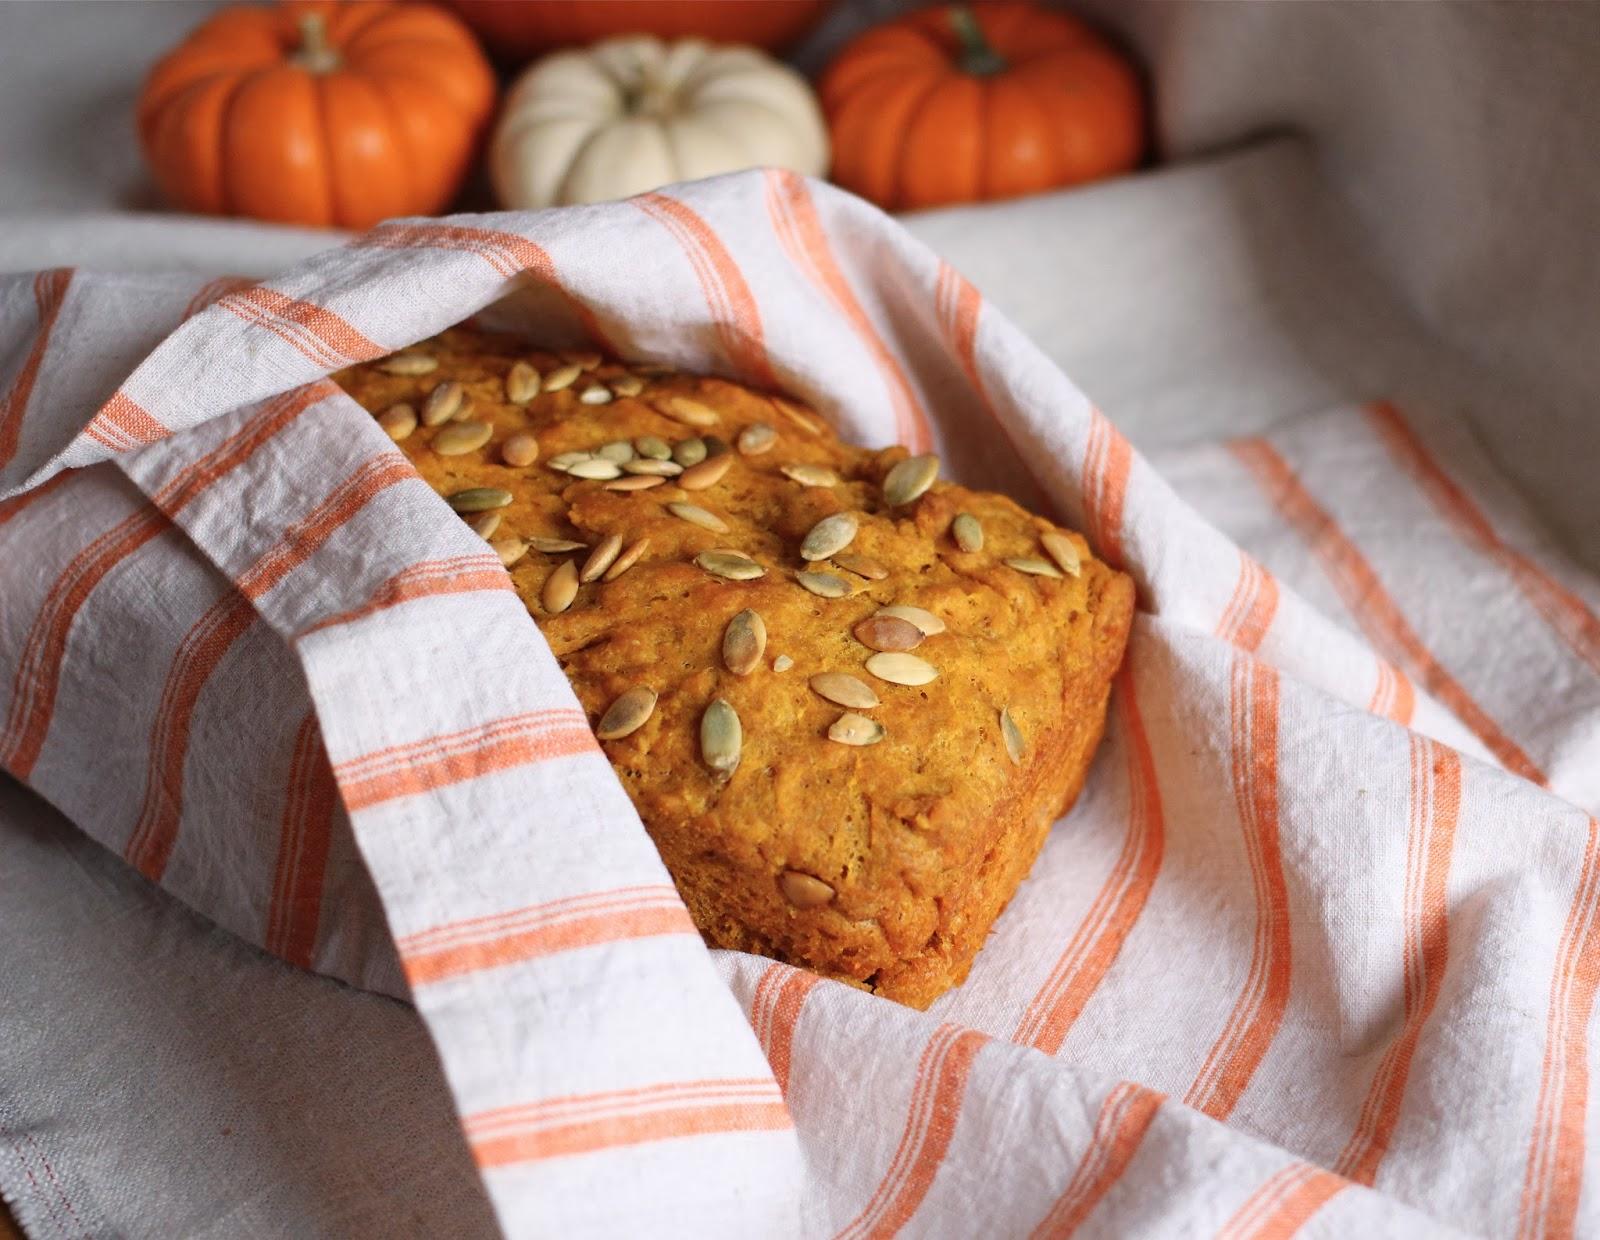 Arctic Garden Studio Whole Wheat Bread With Pumpkin